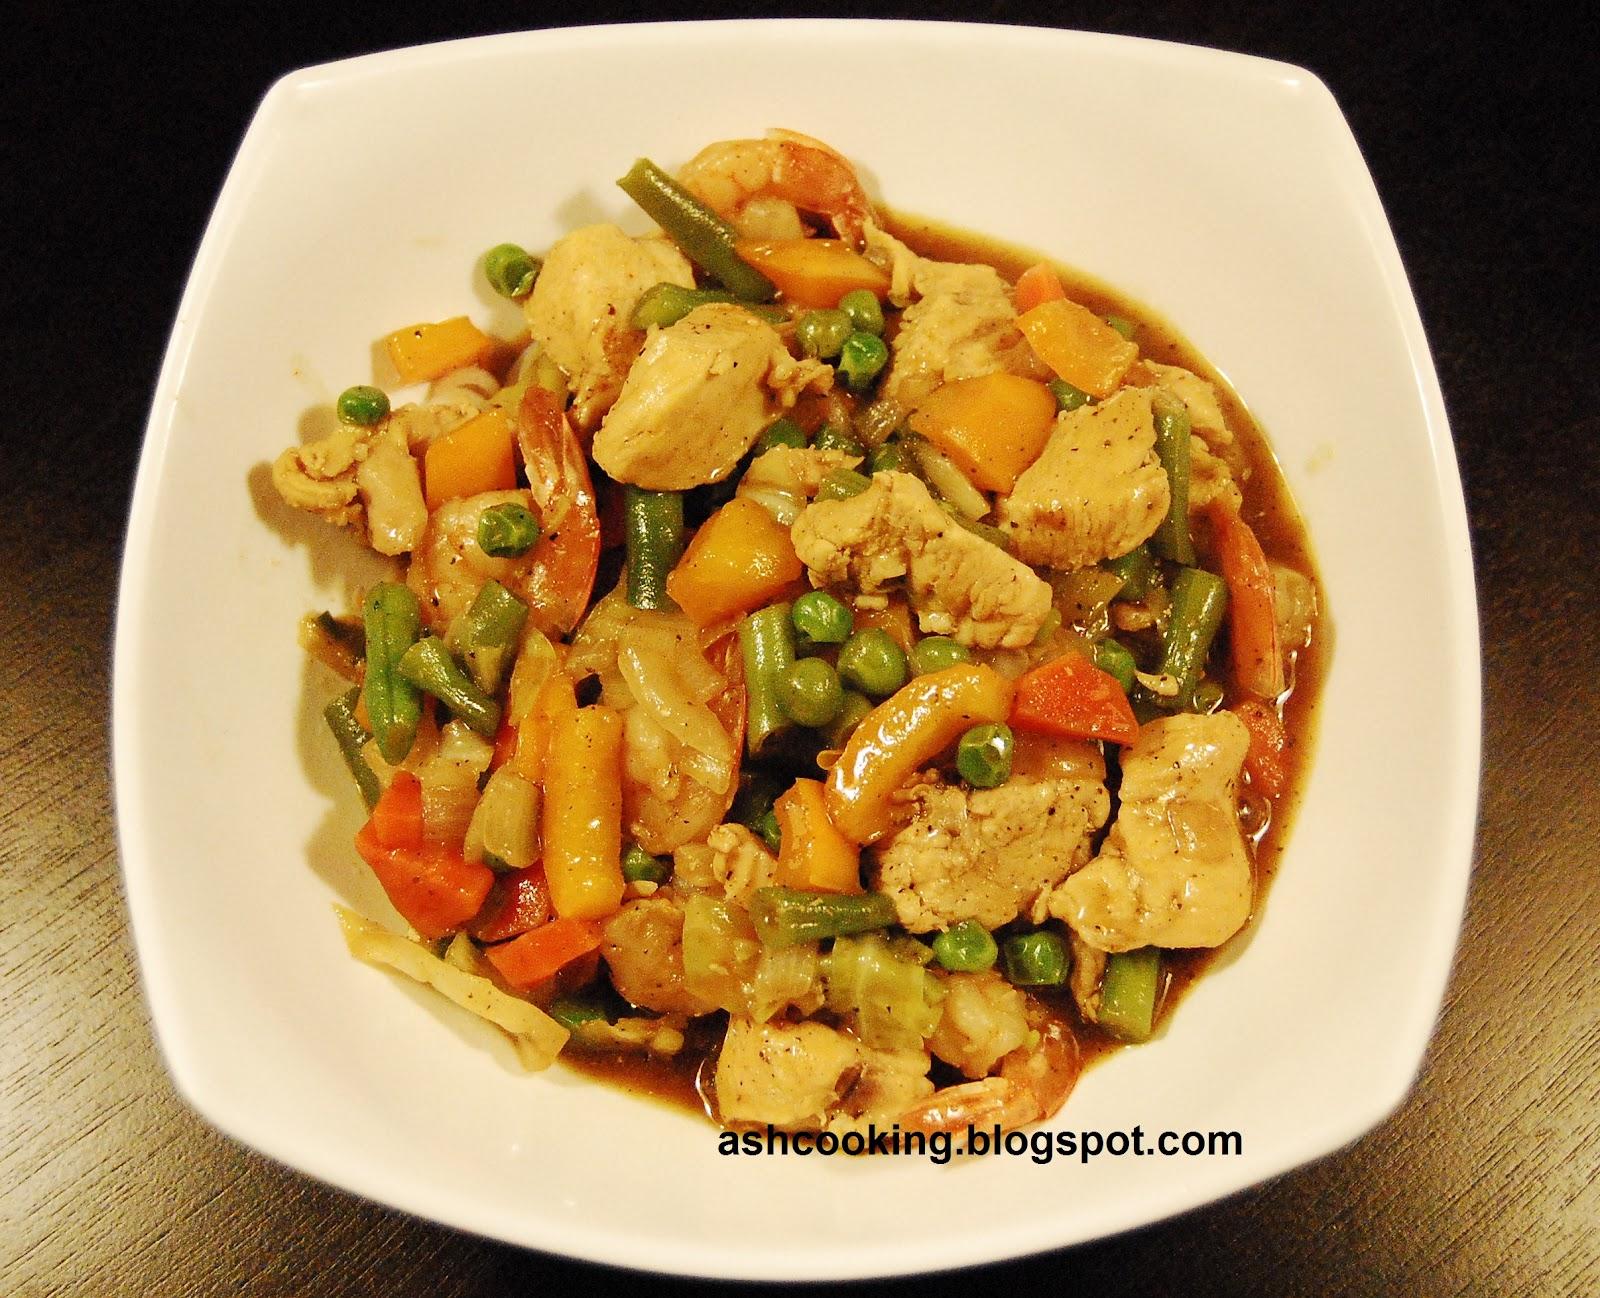 Chinese Beef Chop Suey Chicken chopsueyChinese Beef Chop Suey